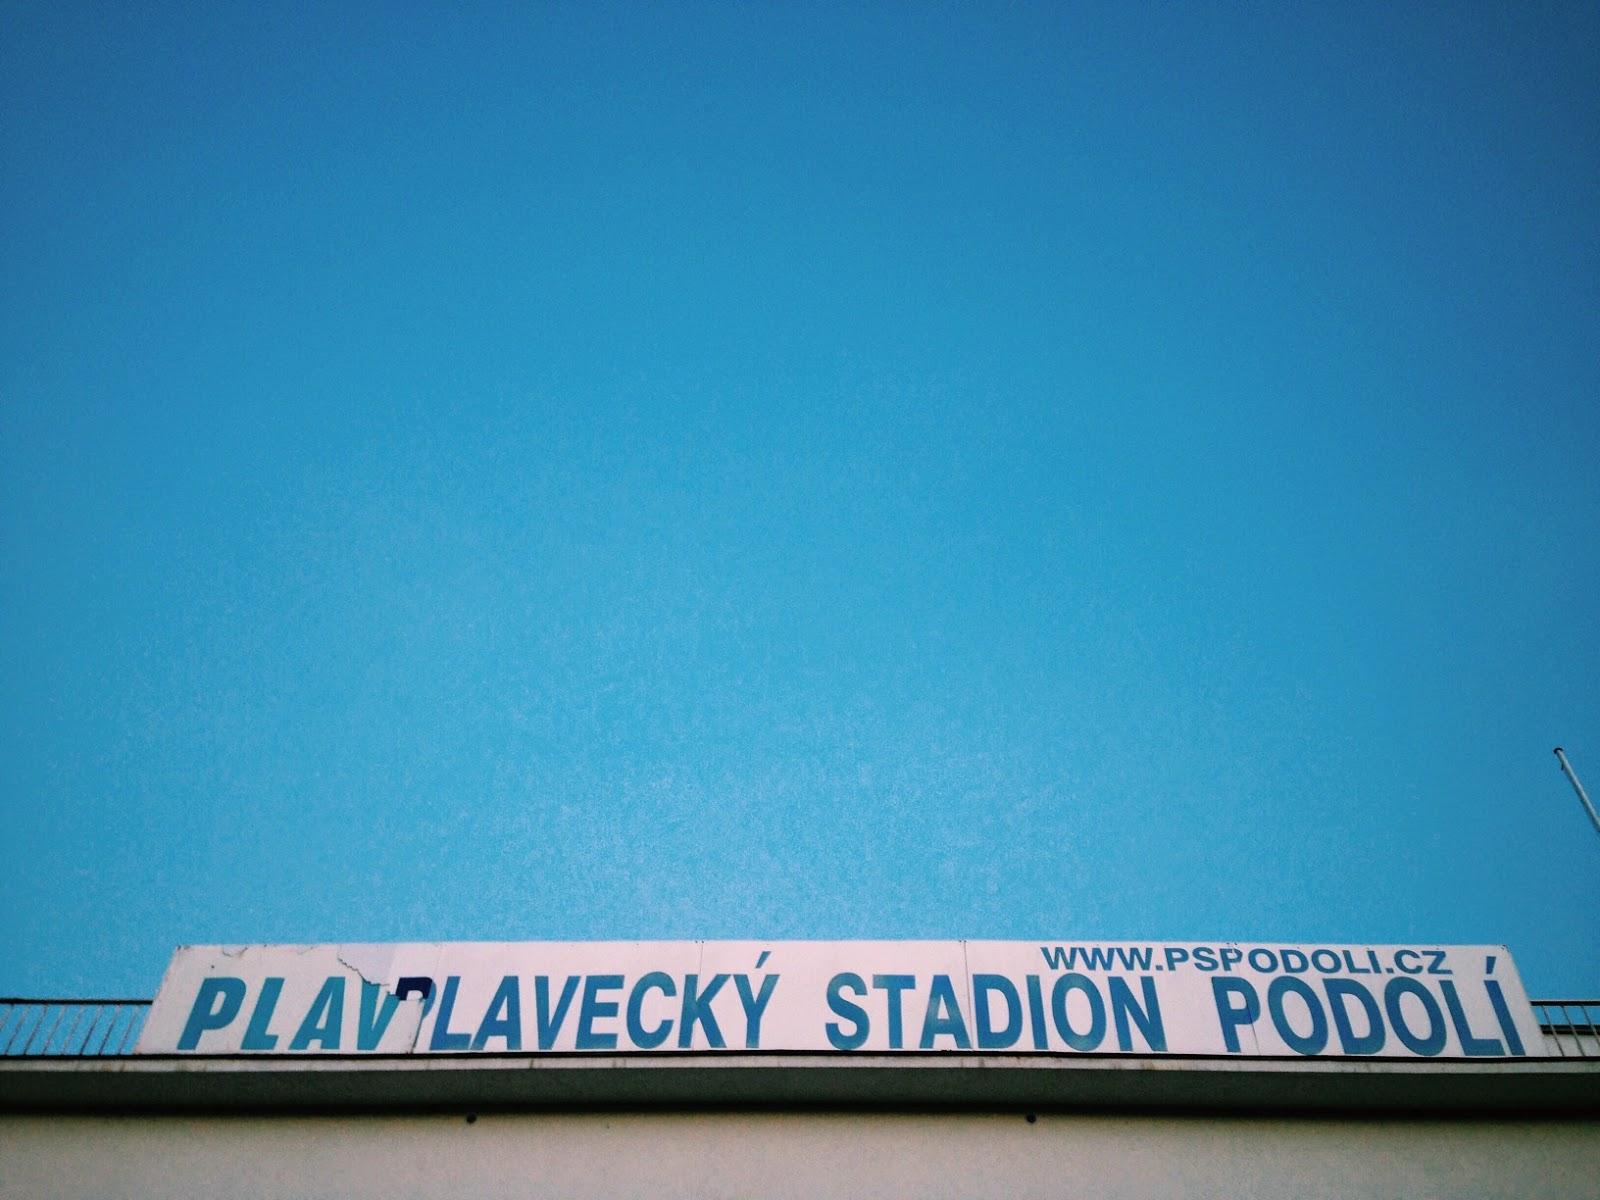 Runssel plaveck stadium podol prague czech republic - Javascript clear div content ...